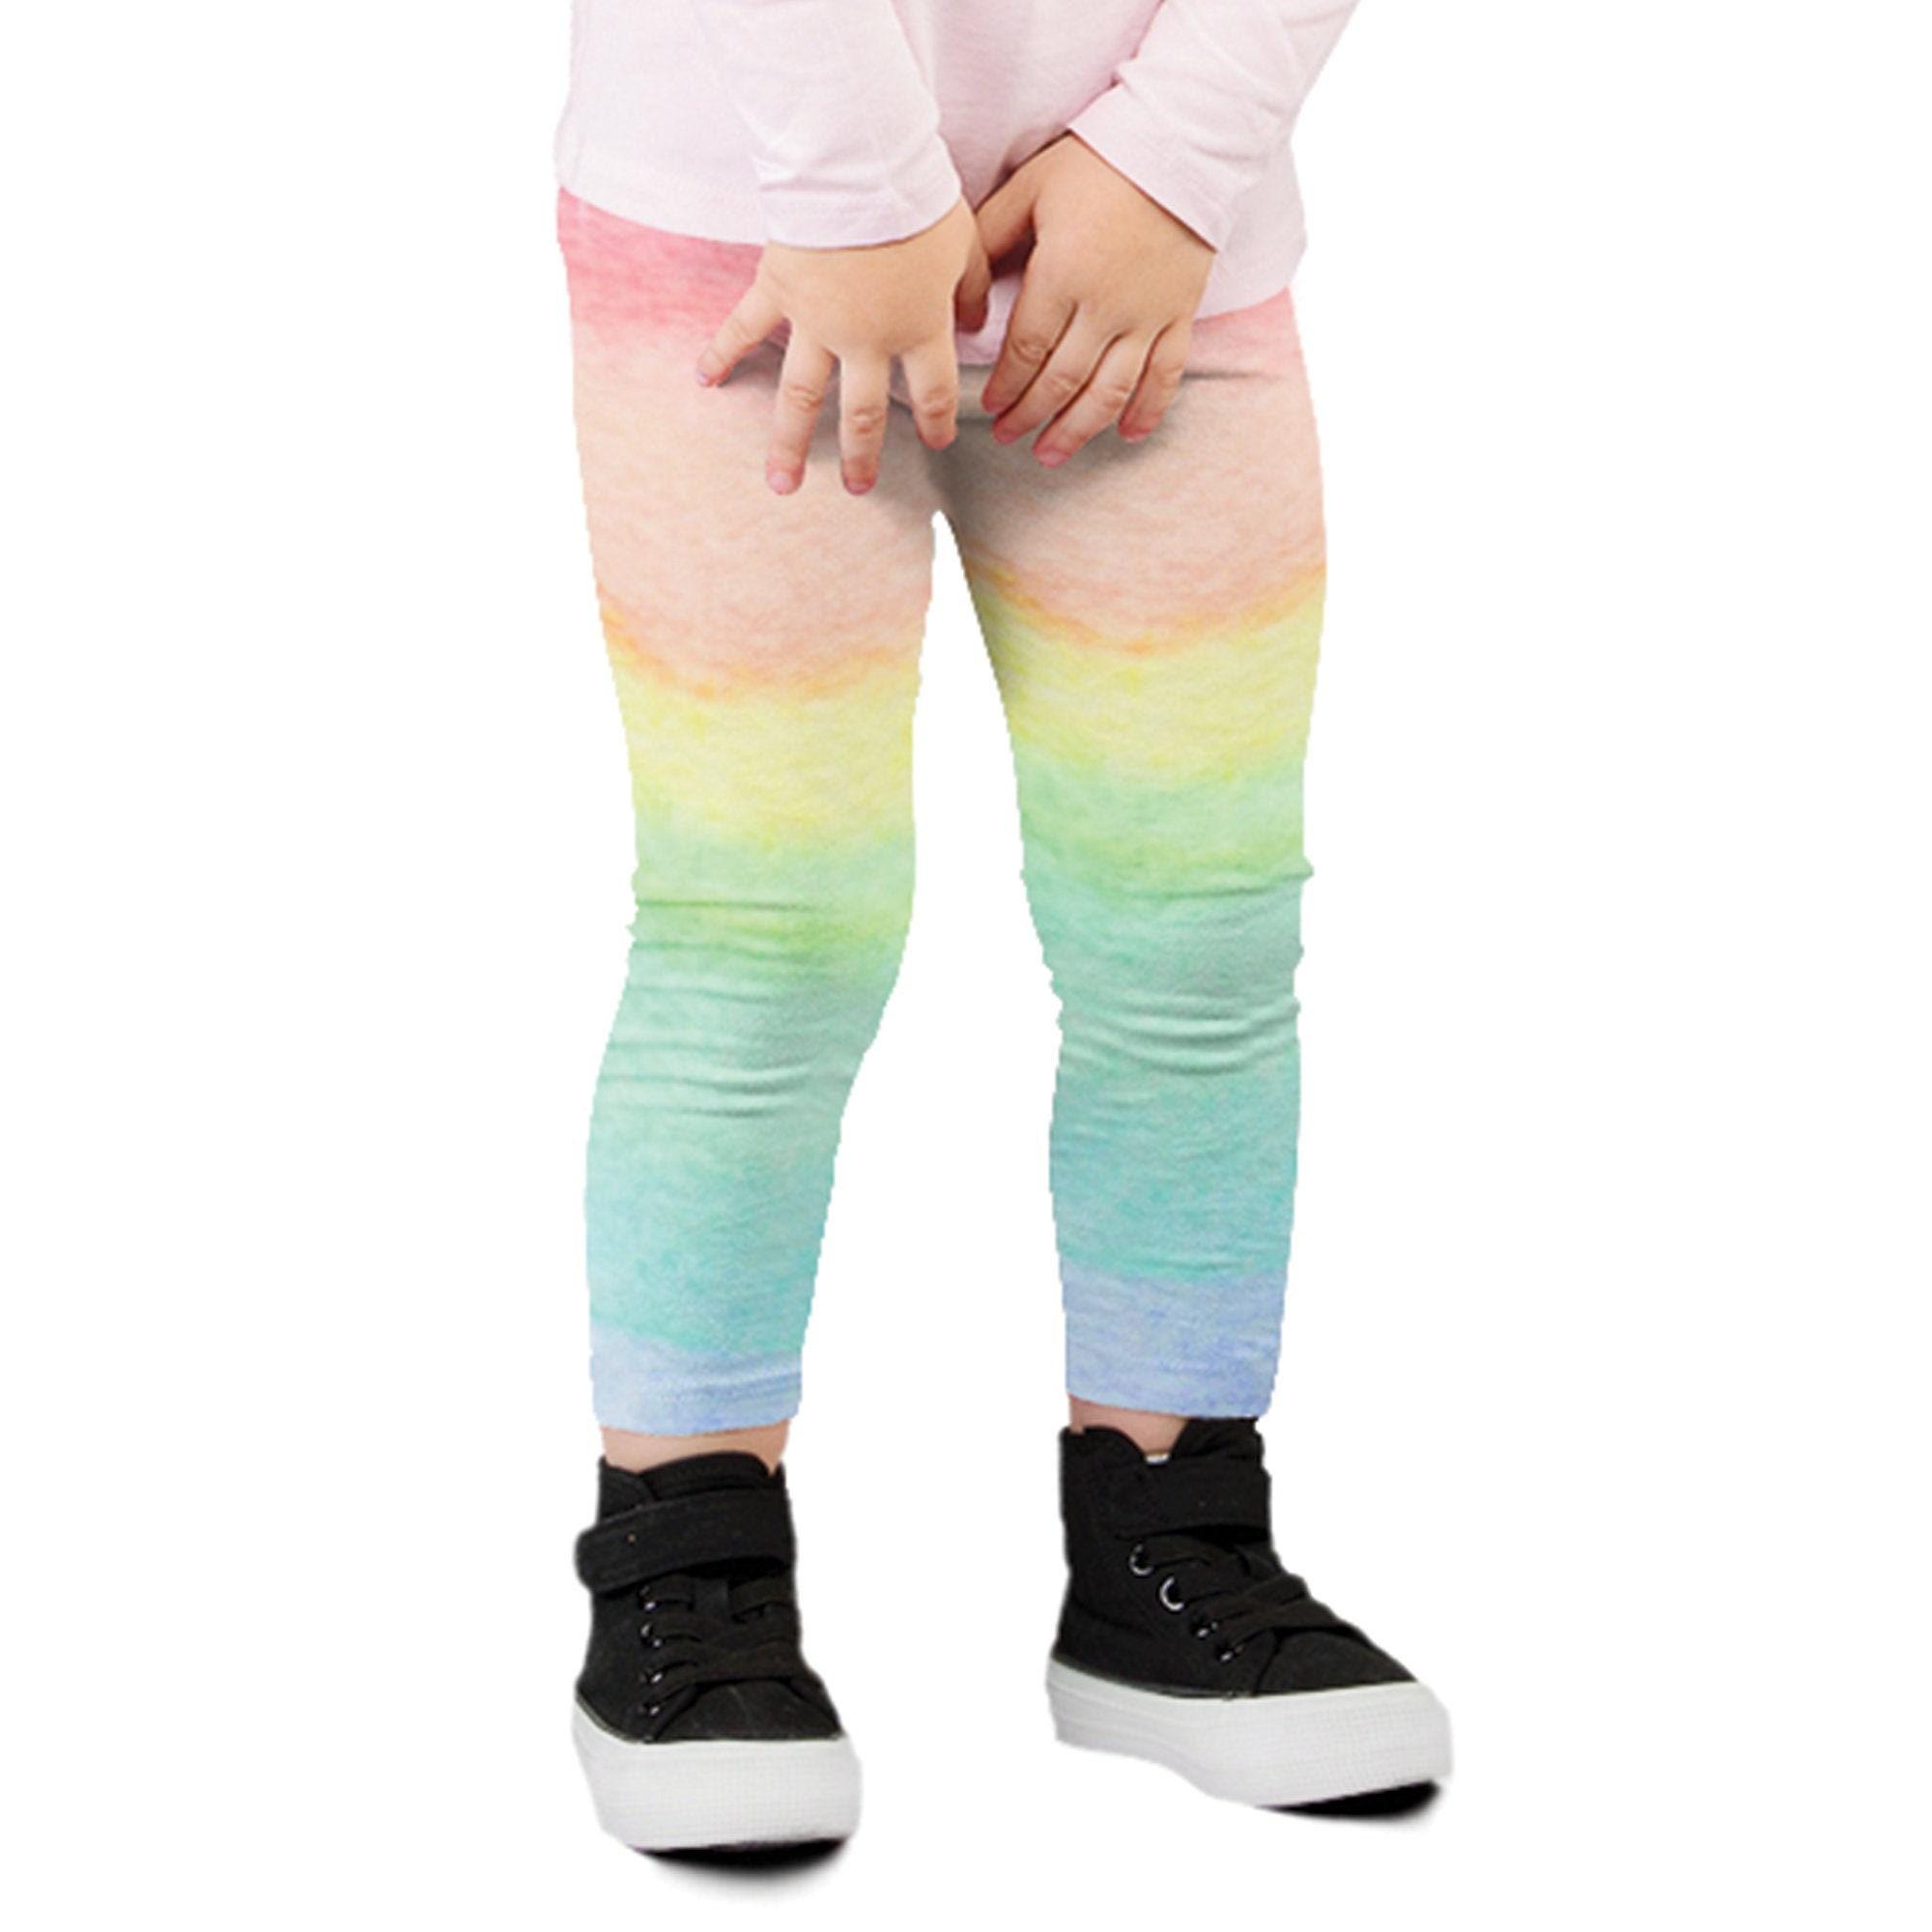 floral tights,kids yoga tights Girls tights girls leggings handmade clothes kids leggings Baby Leggings kids pants